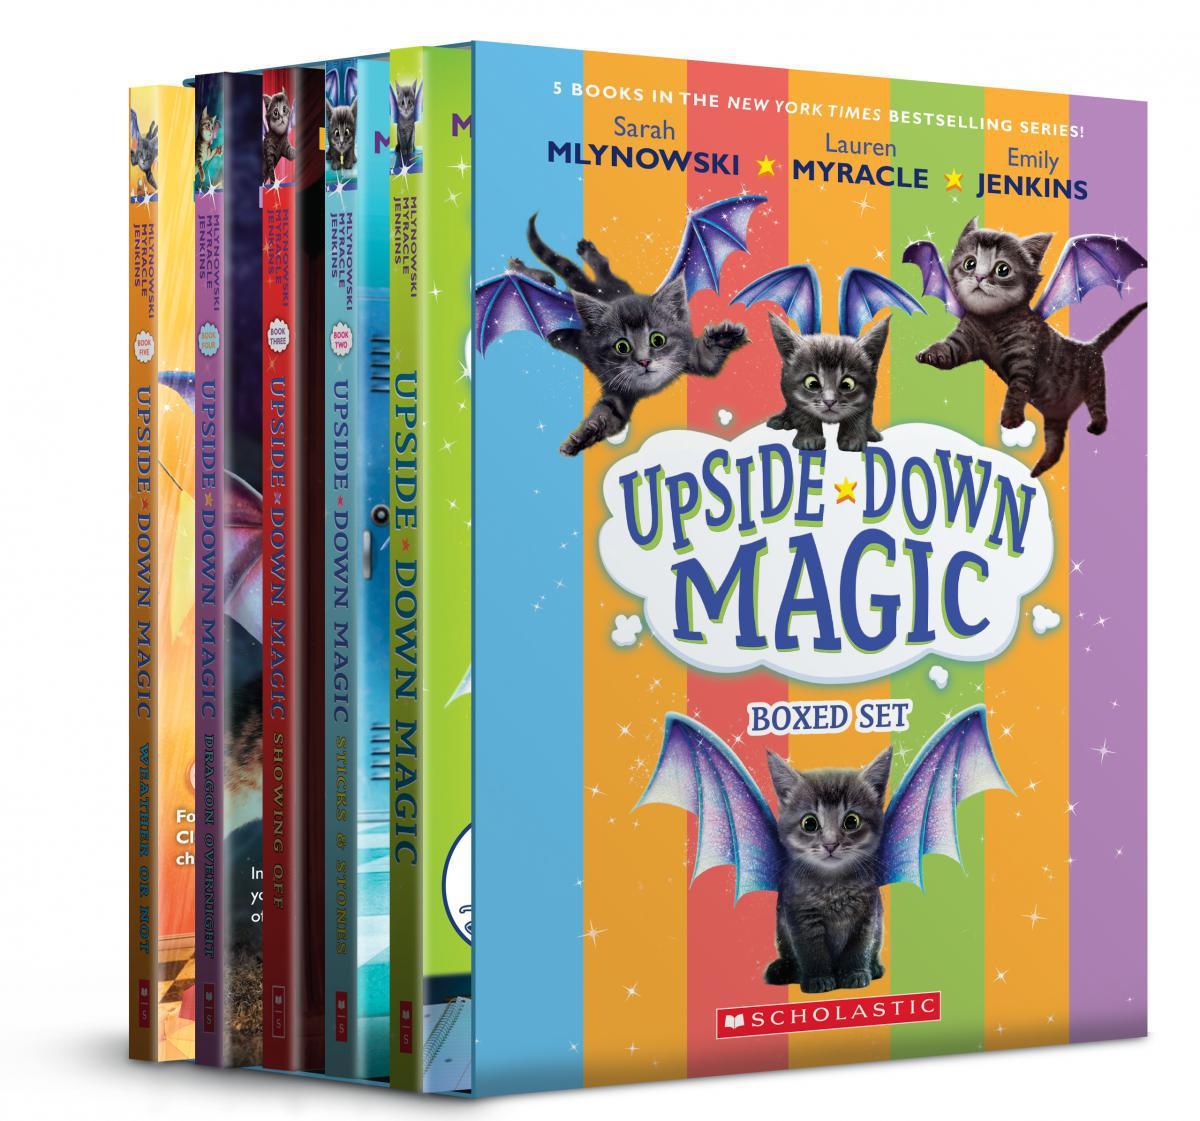 Upside-Down Magic #1-#5 Boxed Set